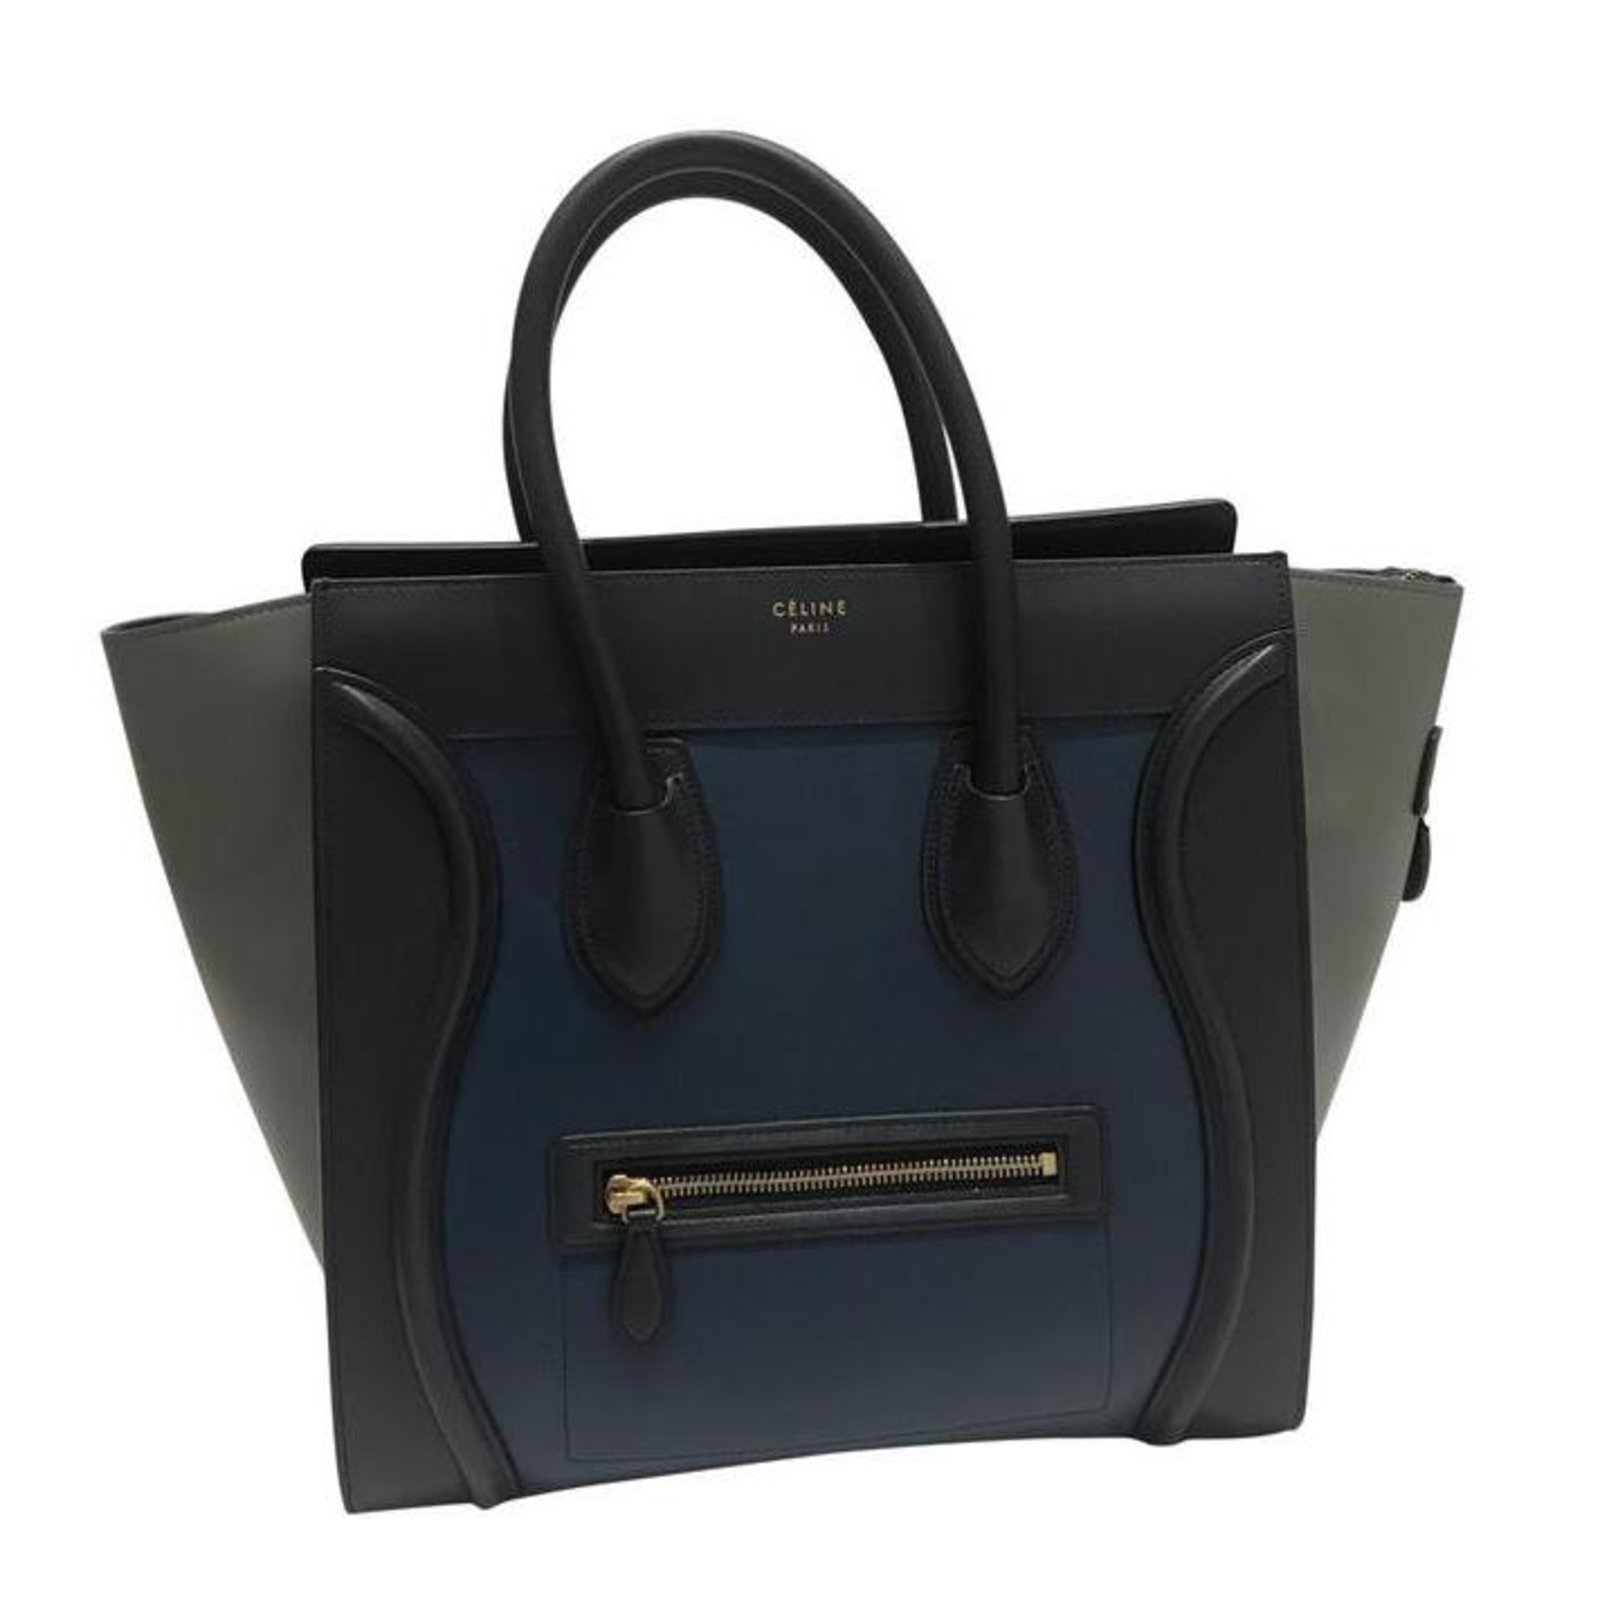 Céline Mini Luggage Handbags Leather Navy blue ref.105664 - Joli Closet 9a91b400898c1